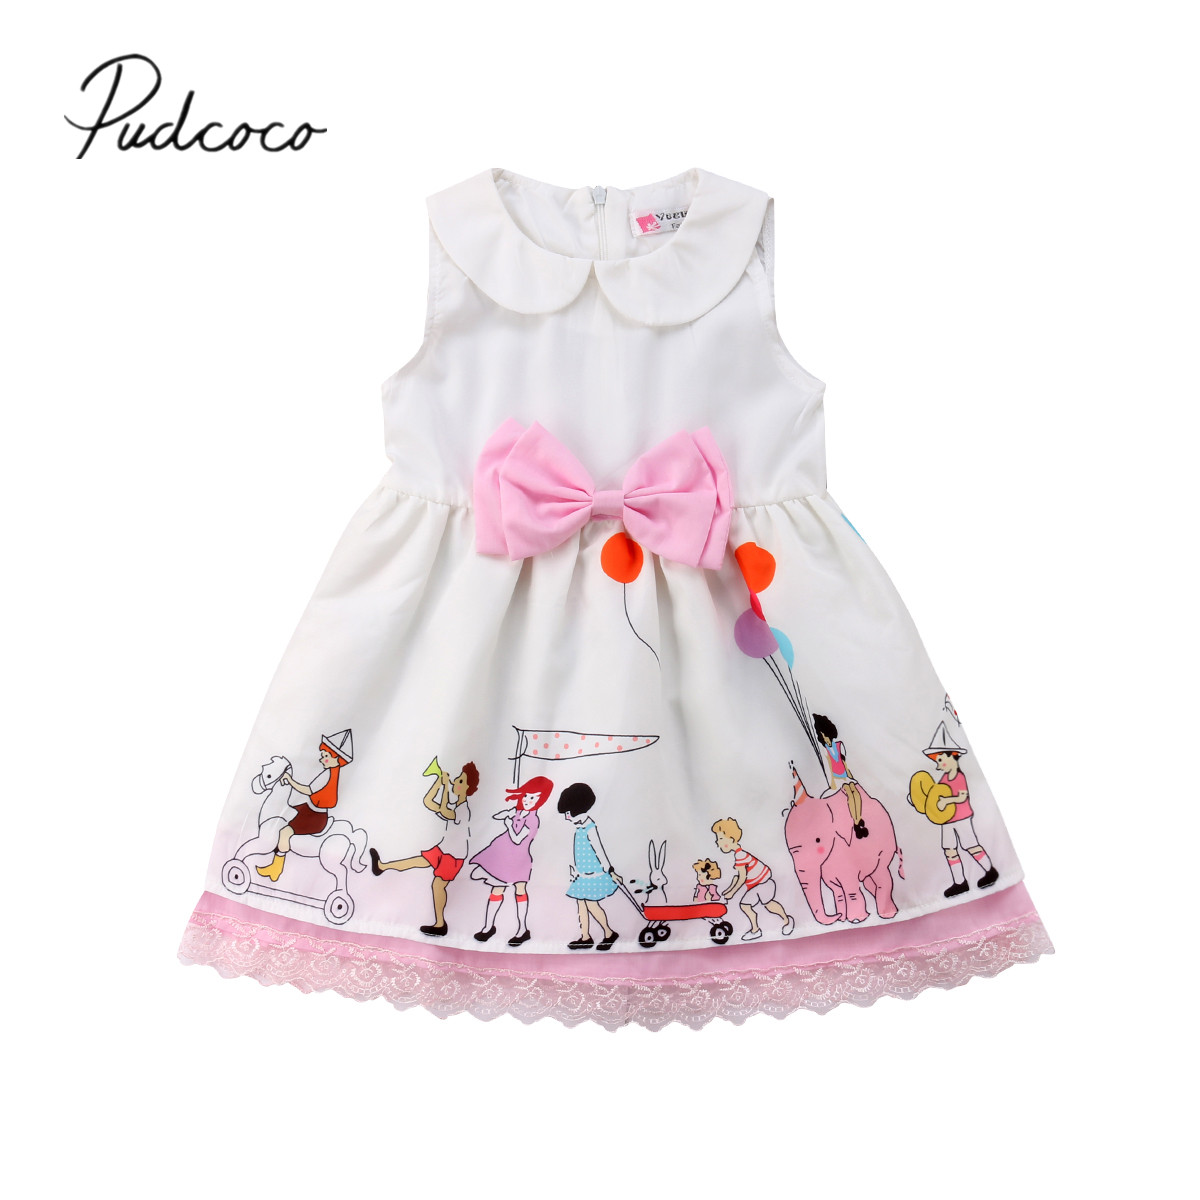 2018 Brand New Princess Summer Toddler Baby Girls Dress